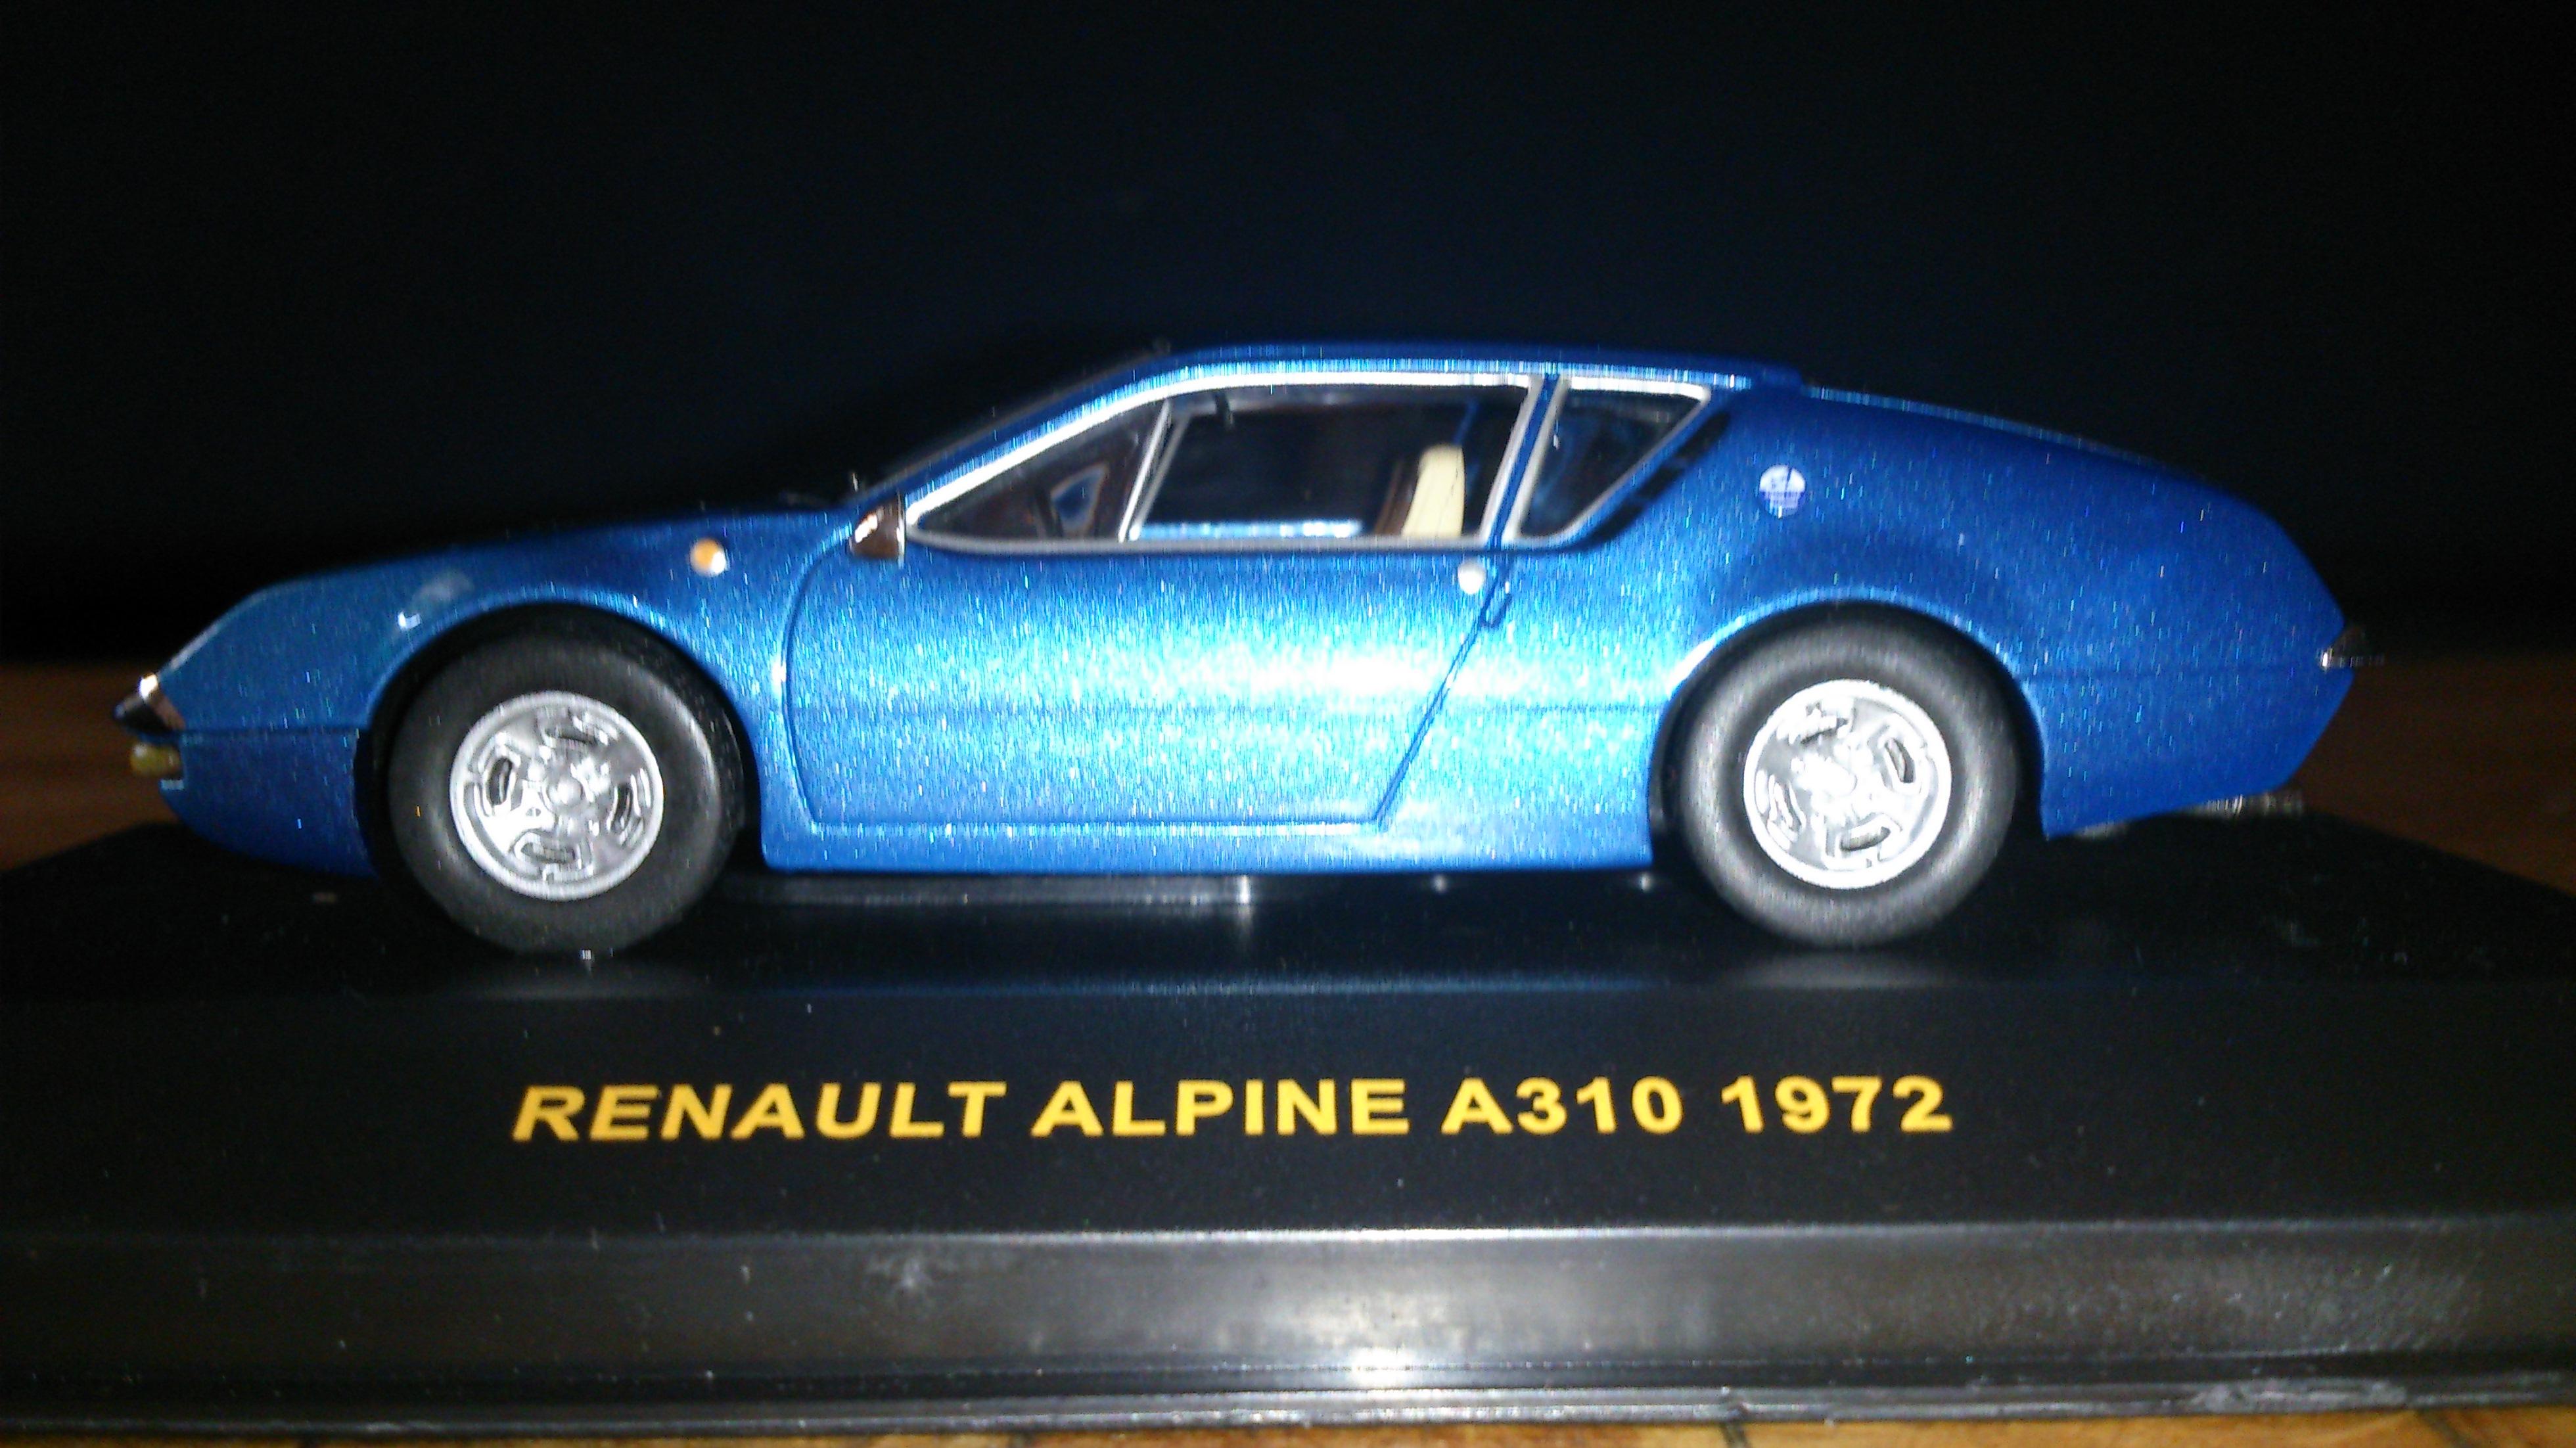 Renault_Alpine_A310_1972_2